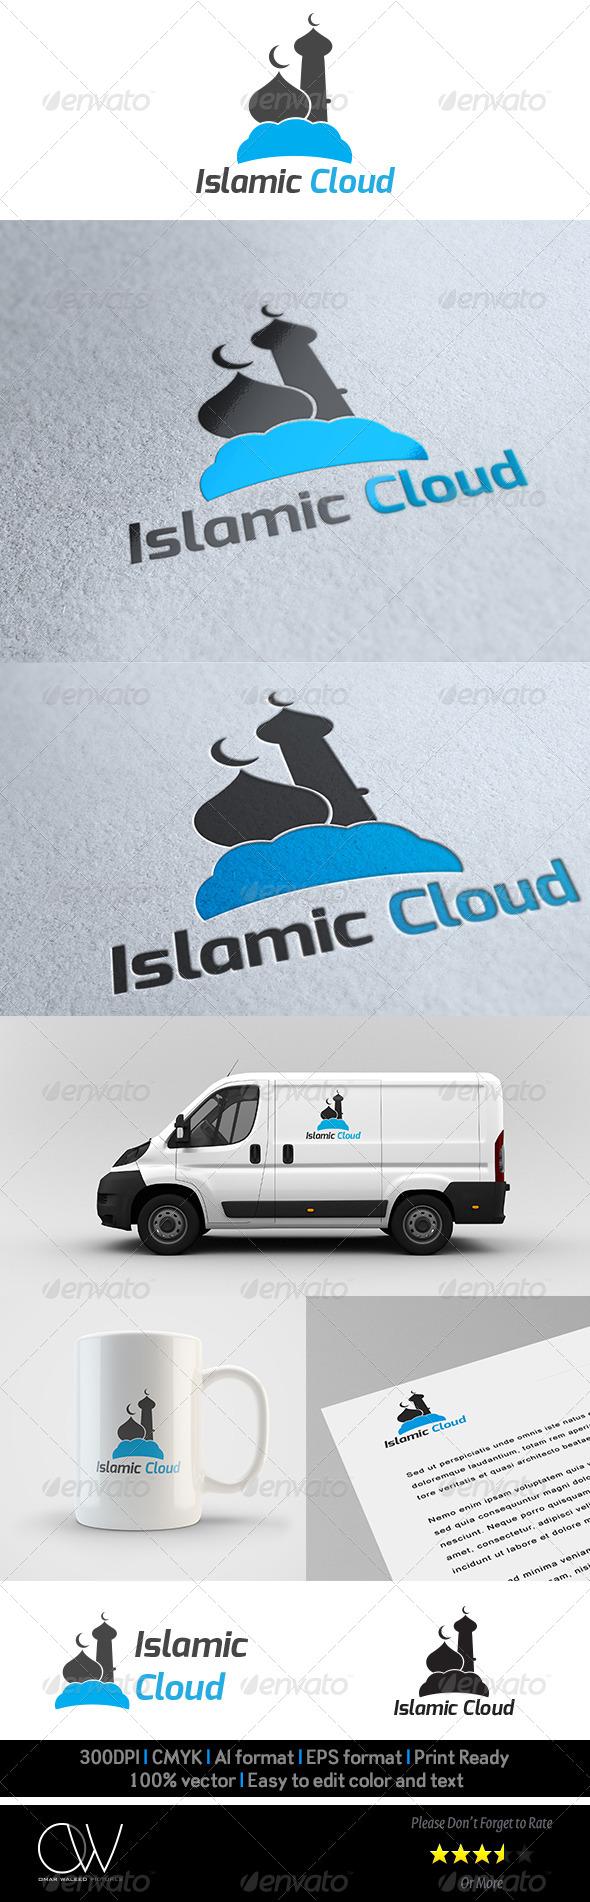 GraphicRiver Islamic Cloud Logo Template 5958192